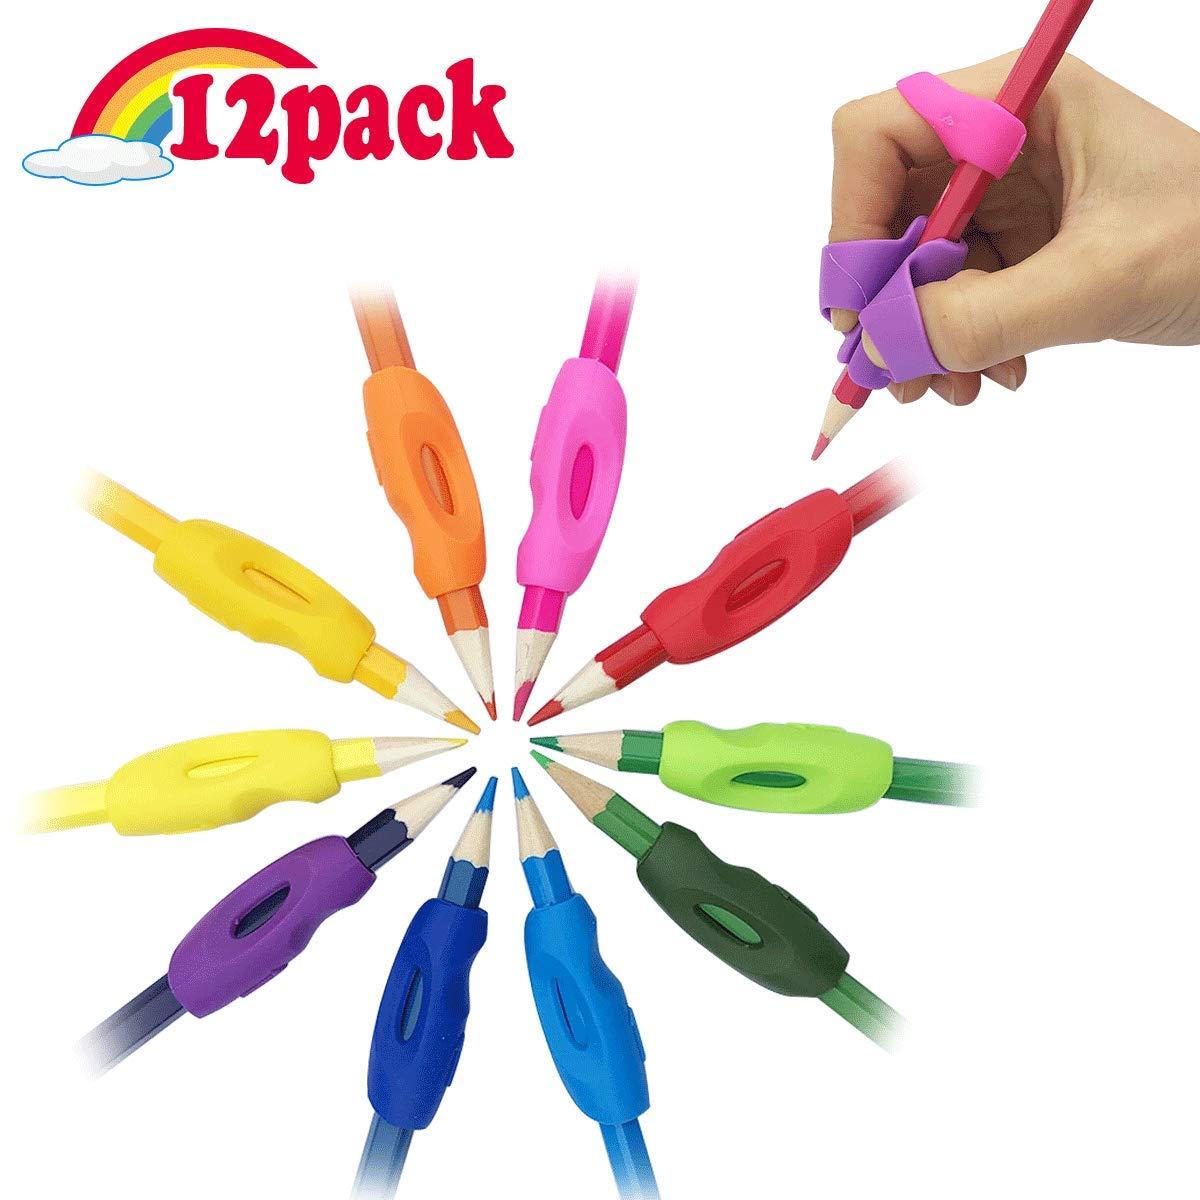 Children Pencil Holder Writing Aid Grip Trainer,New Design Ergonomic Rainbow Pen Grip Posture Correction Training Tools for Kids Set of 12 PCS LINFEN Pencil Grip